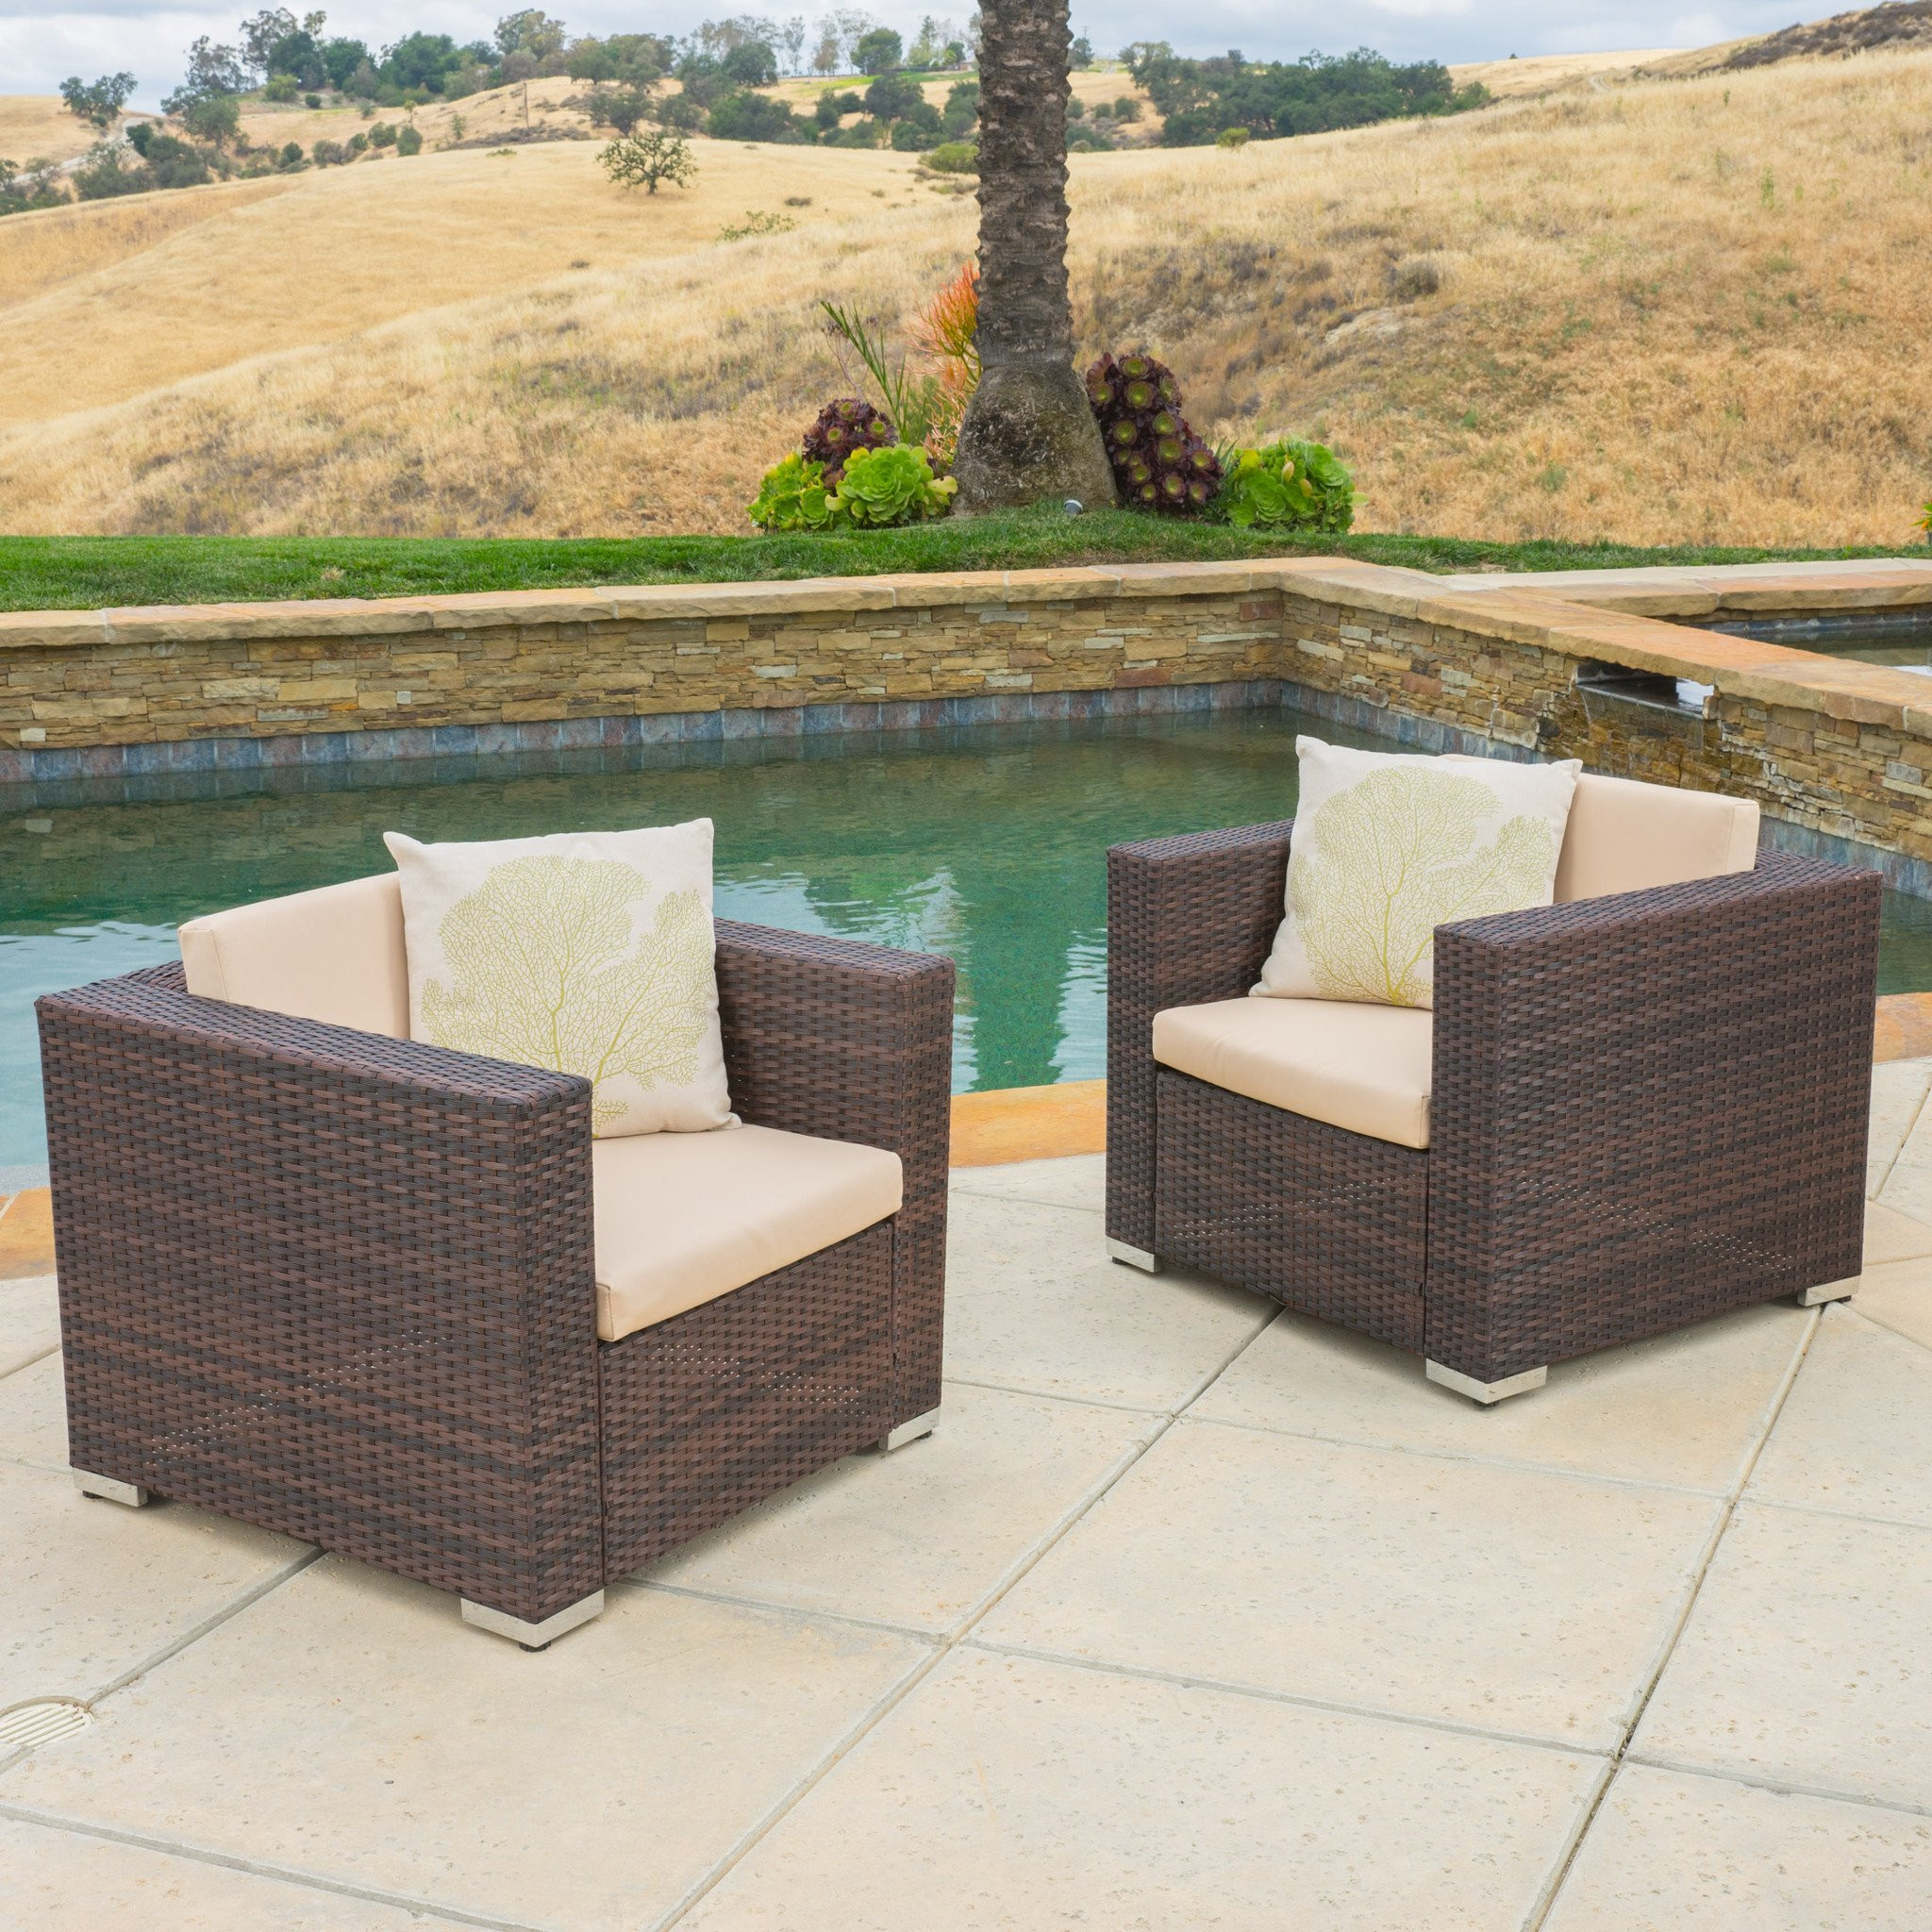 Westlake Outdoor Brown PE Wicker Sofa Club Chairs...